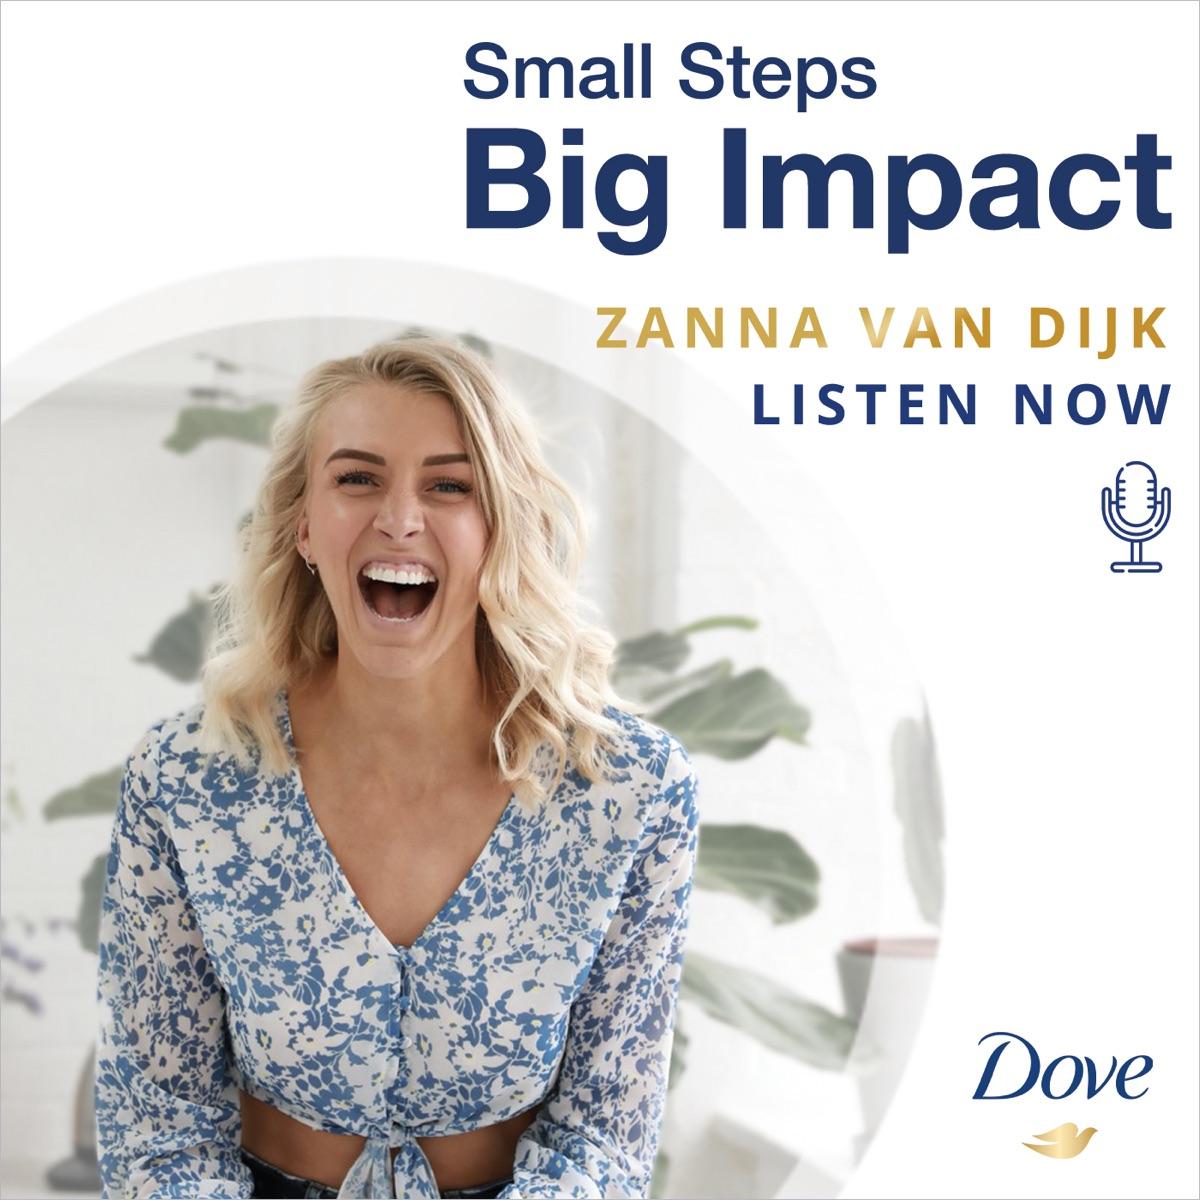 Small Steps Big Impact